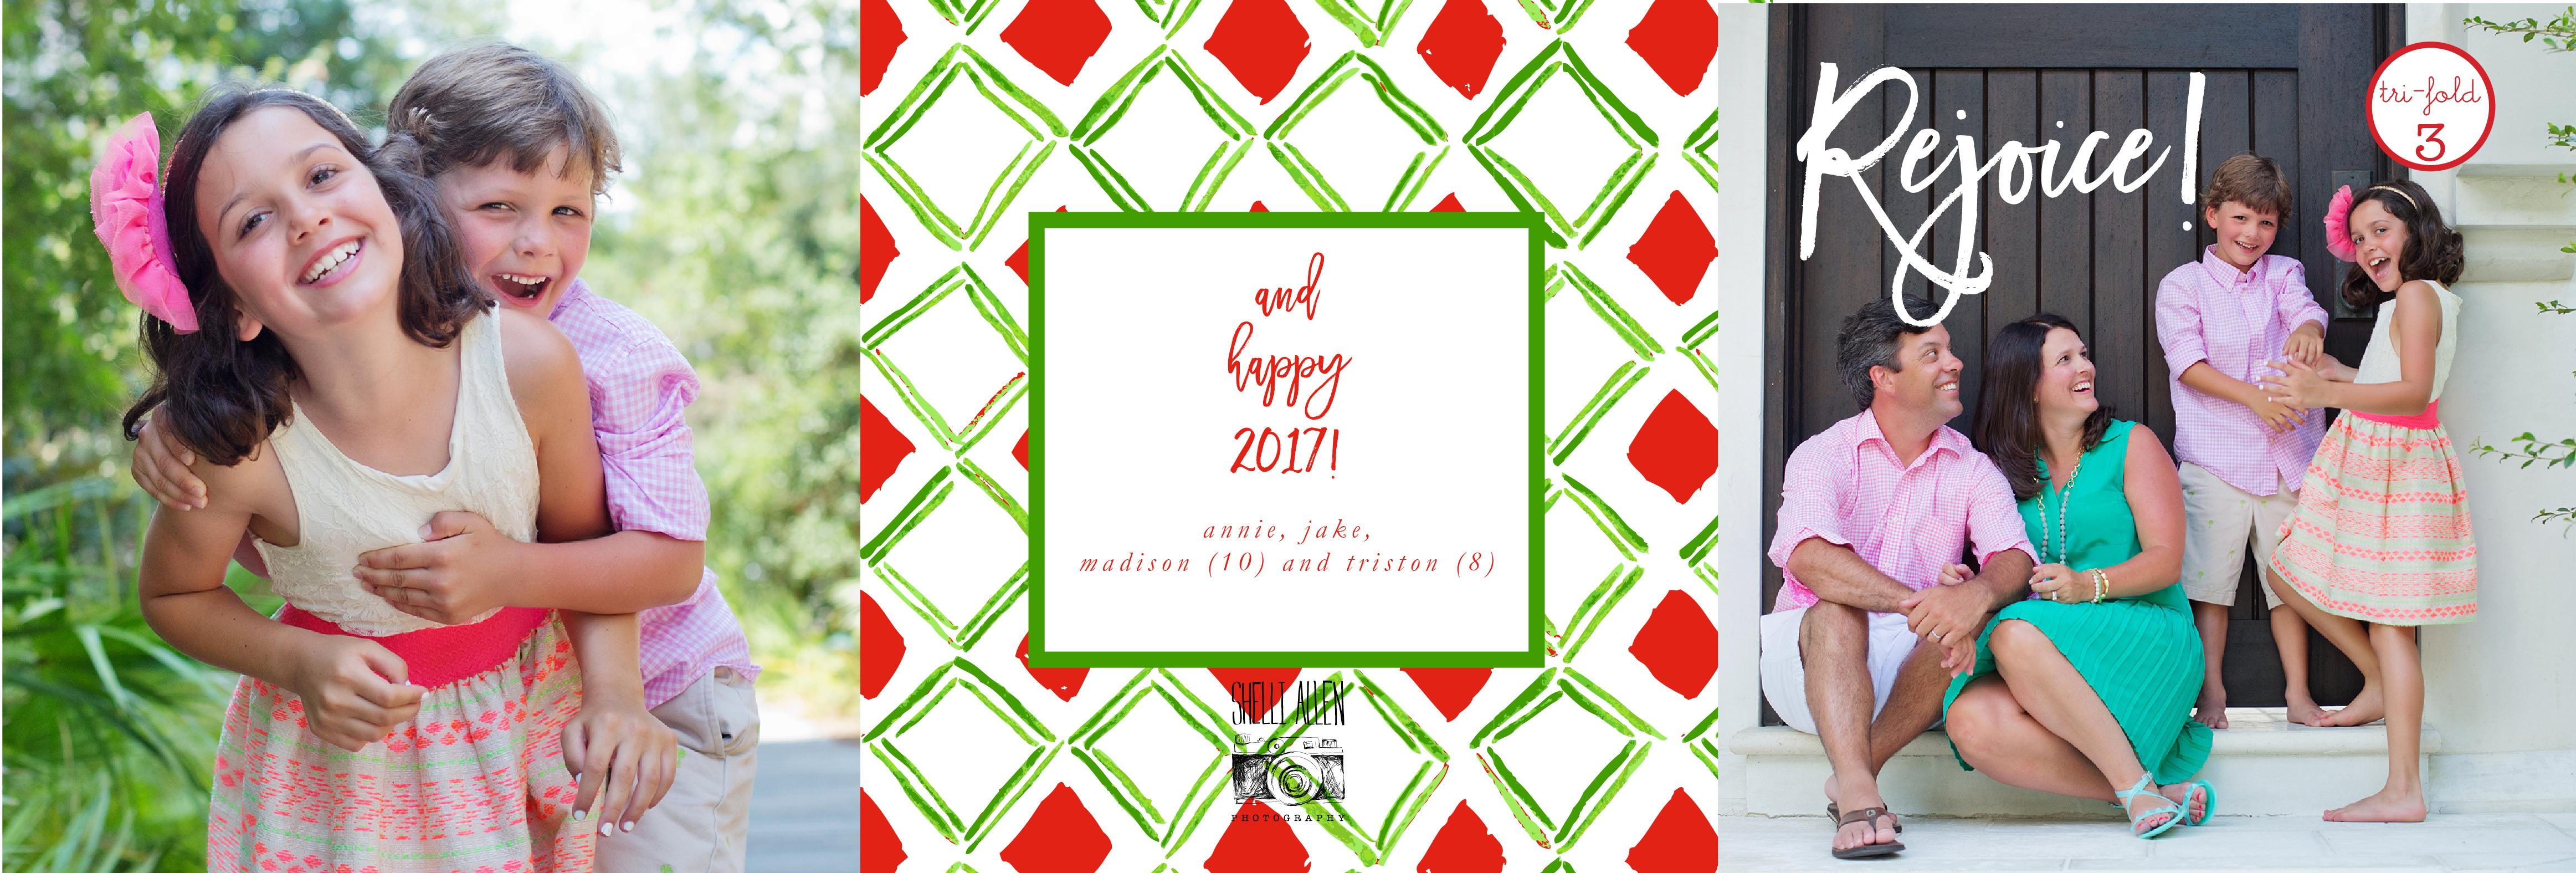 sap christmas cards 2016 tri folds15 - Tri Fold Christmas Cards